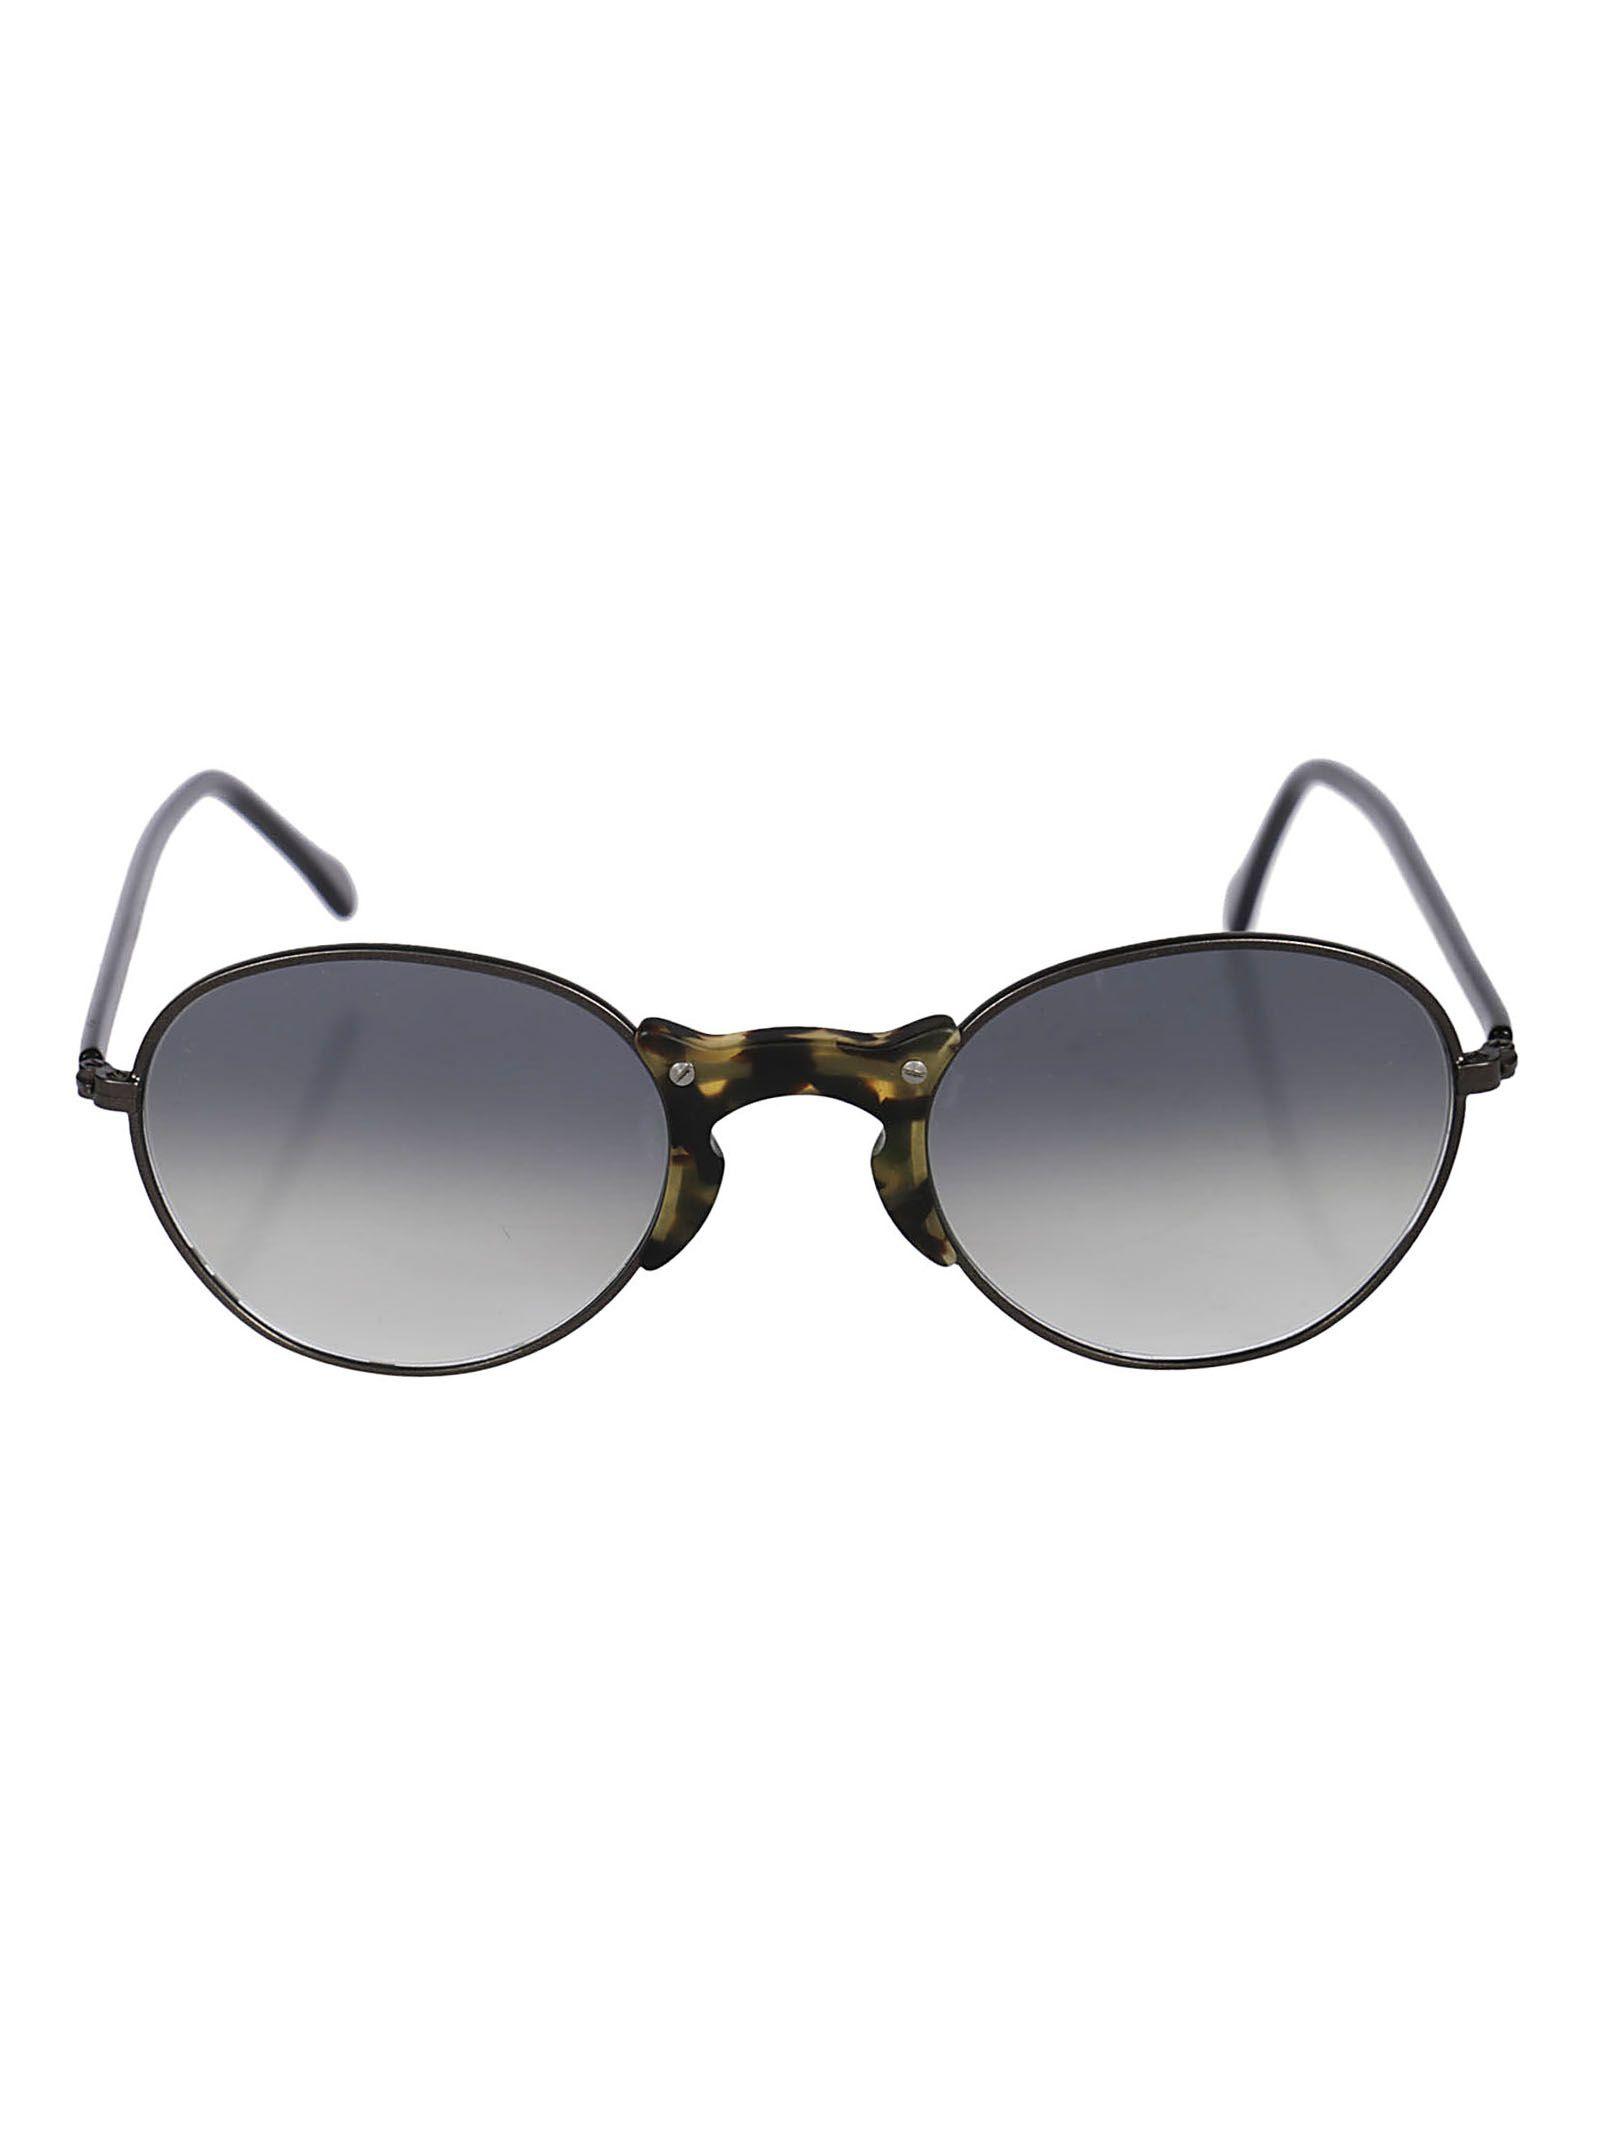 L.G.R Lgr Round Sunglasses in Gun/Mimetic